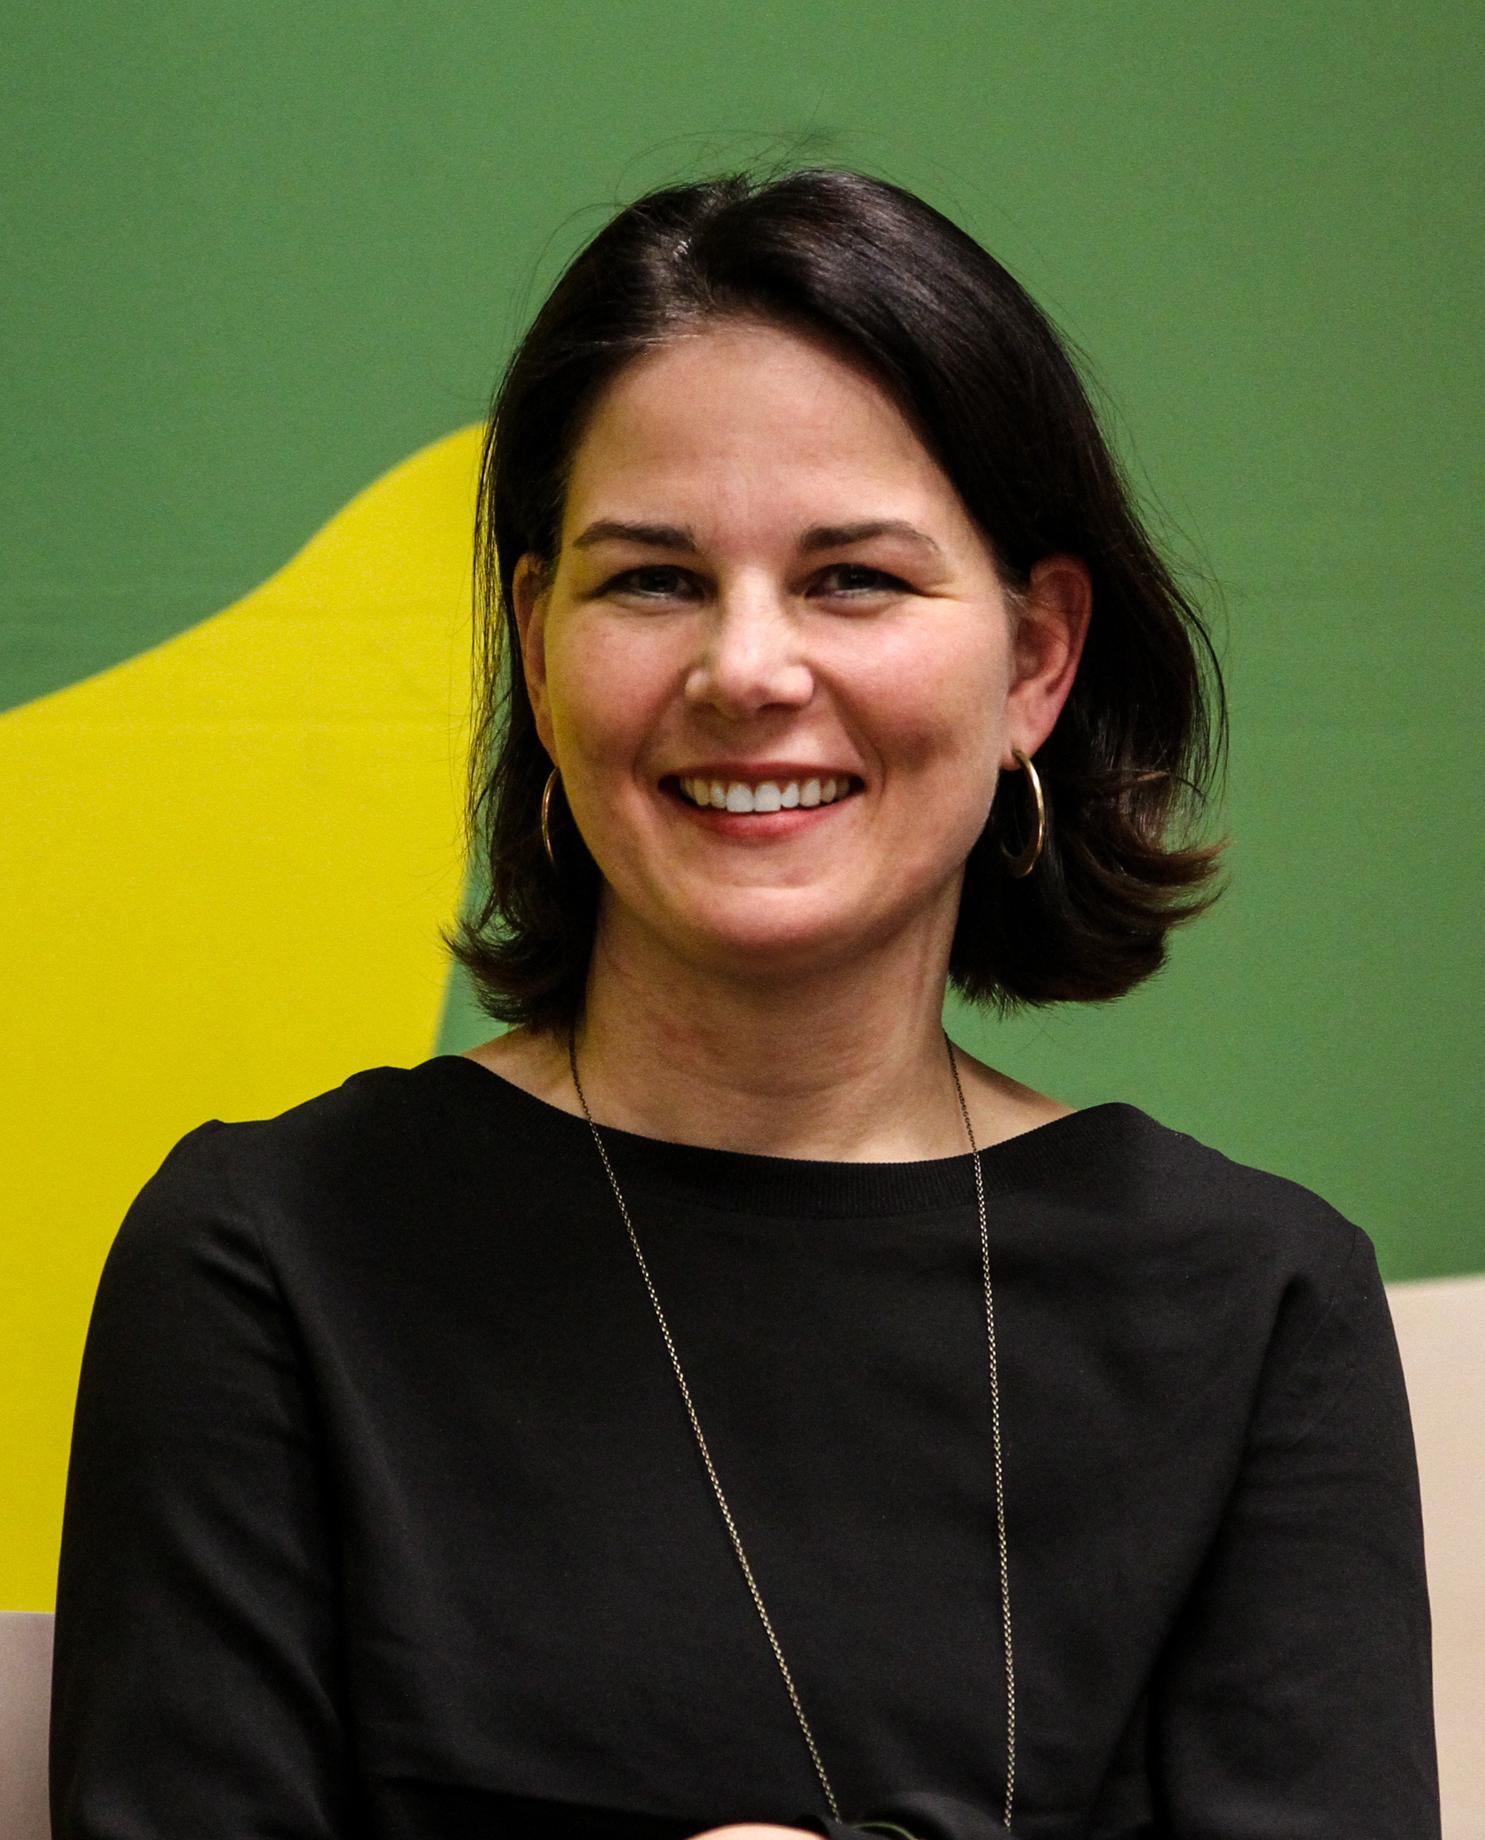 Annalena Baerbock Wikipedia